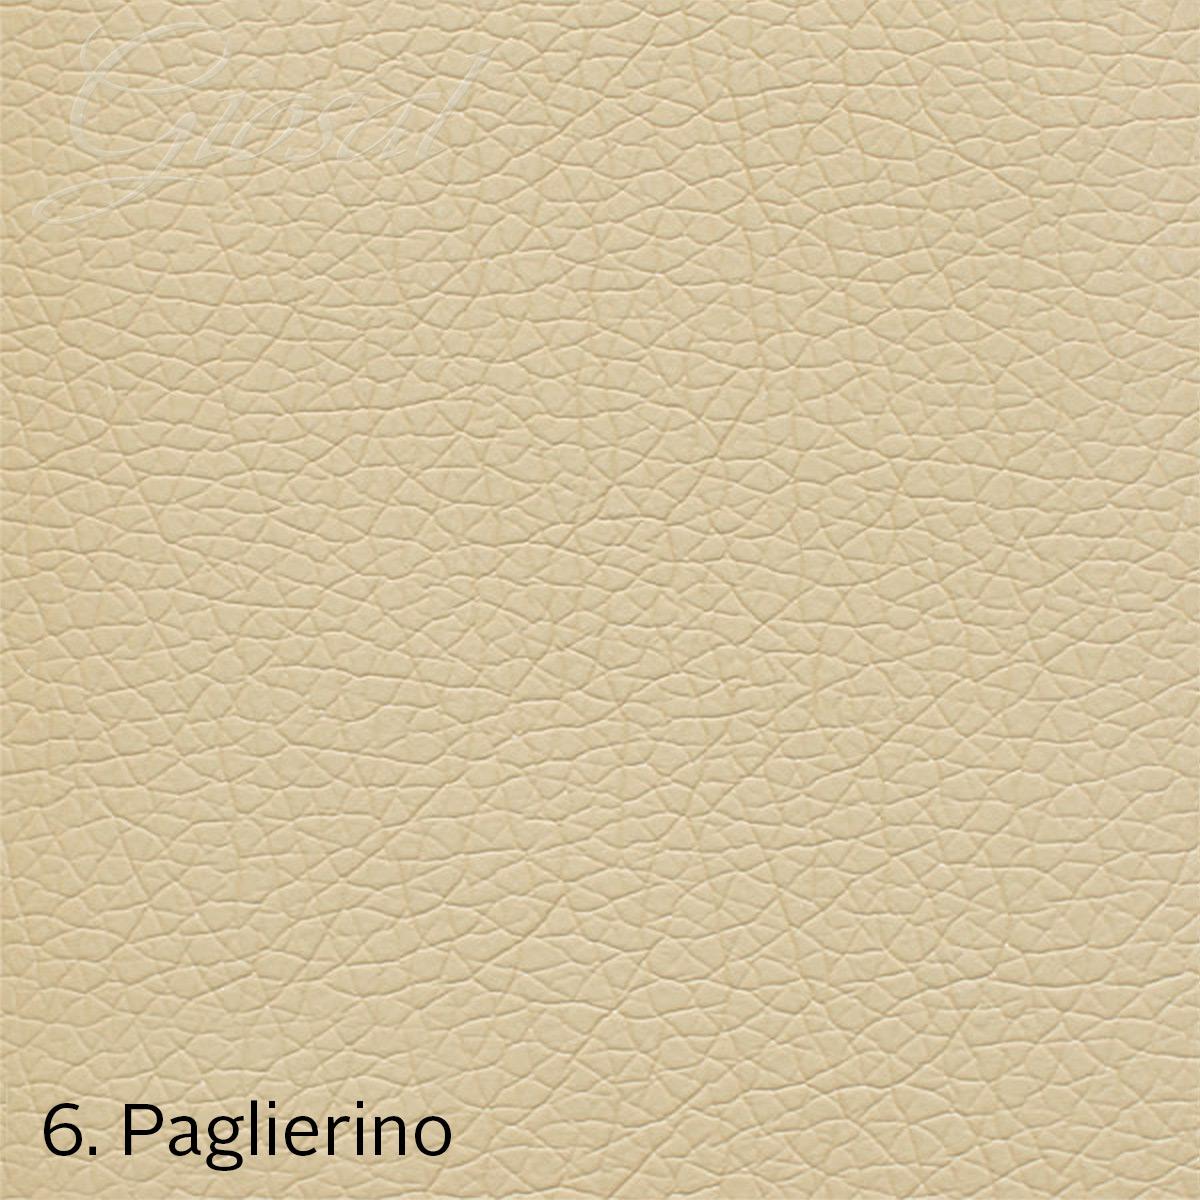 Tessuto-Tappezzeria-Ecopelle-Al-Metro-Pelle-Sintetica-Rivestimento-Arredo-Var miniatura 31